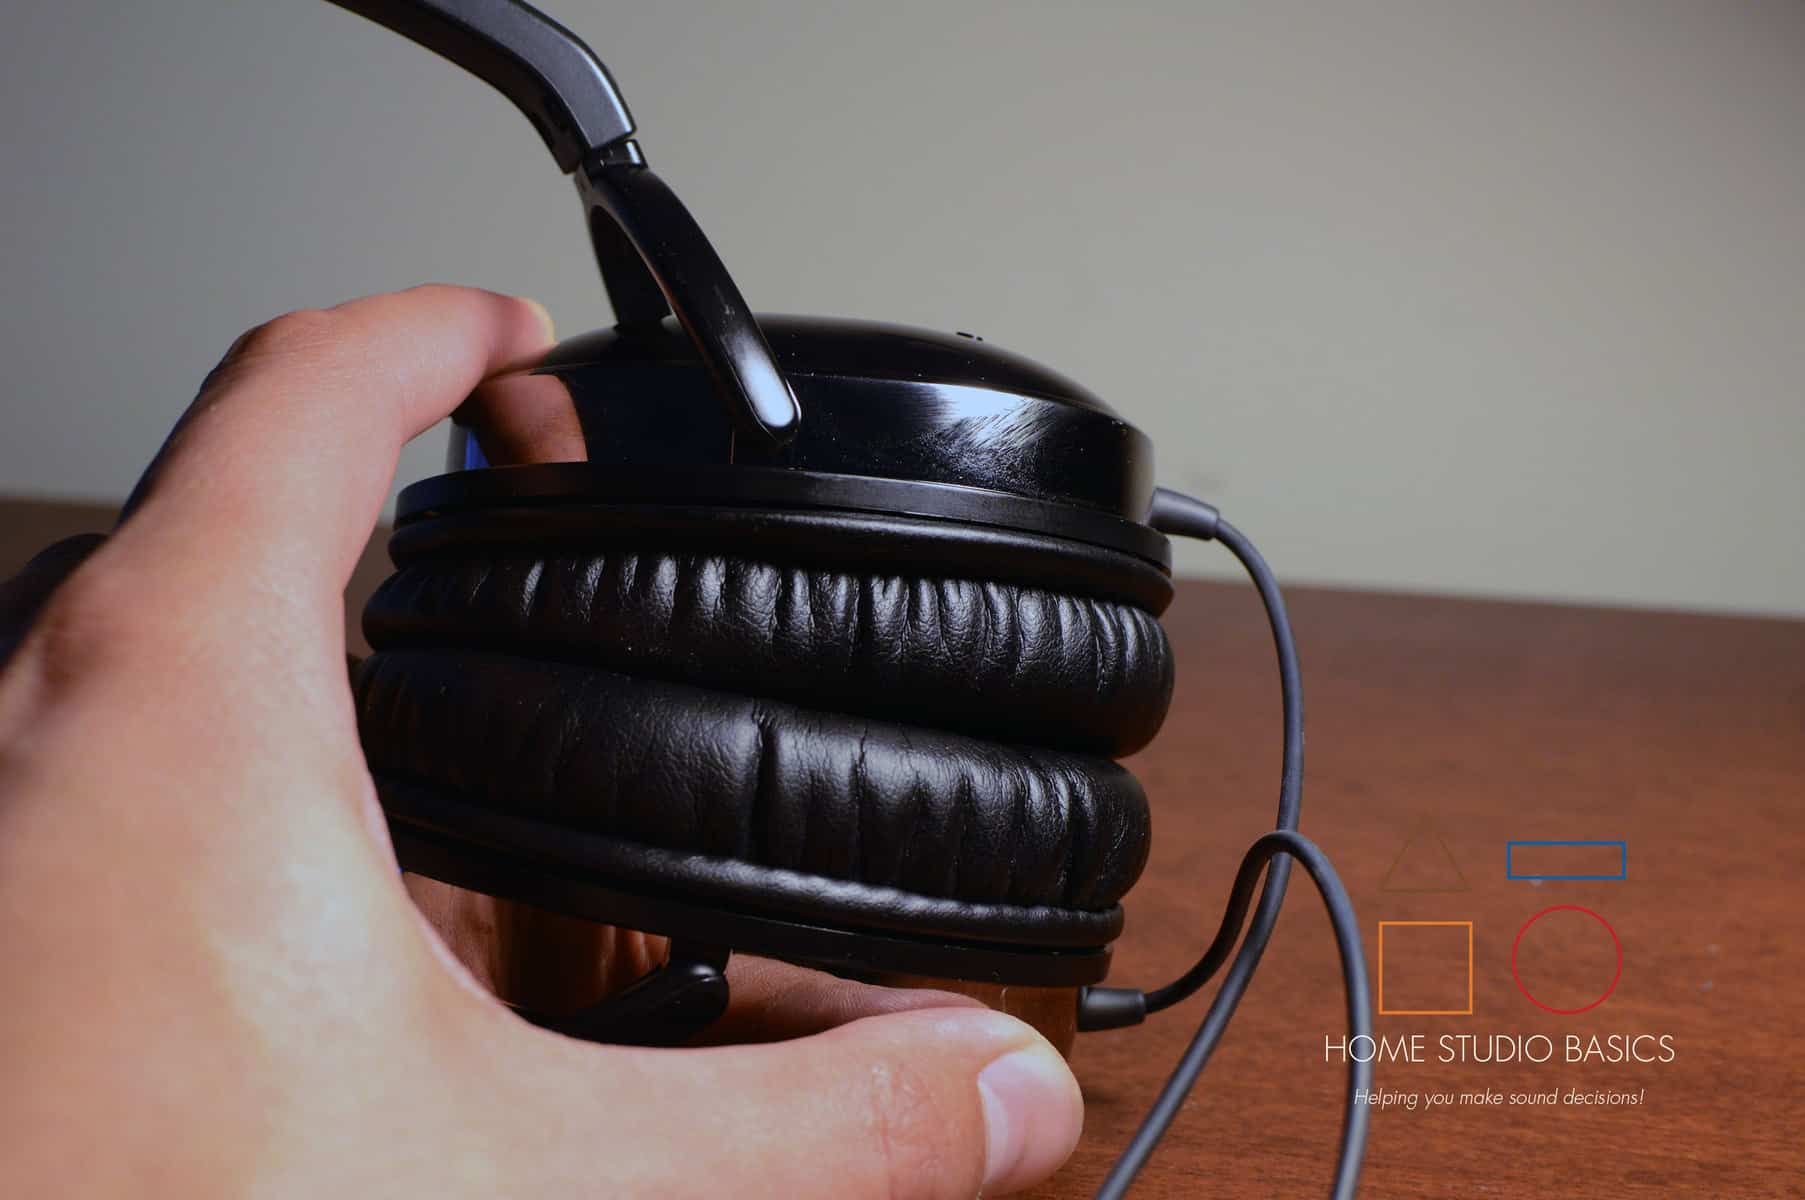 Creative Aurvana Live! Headphone Review